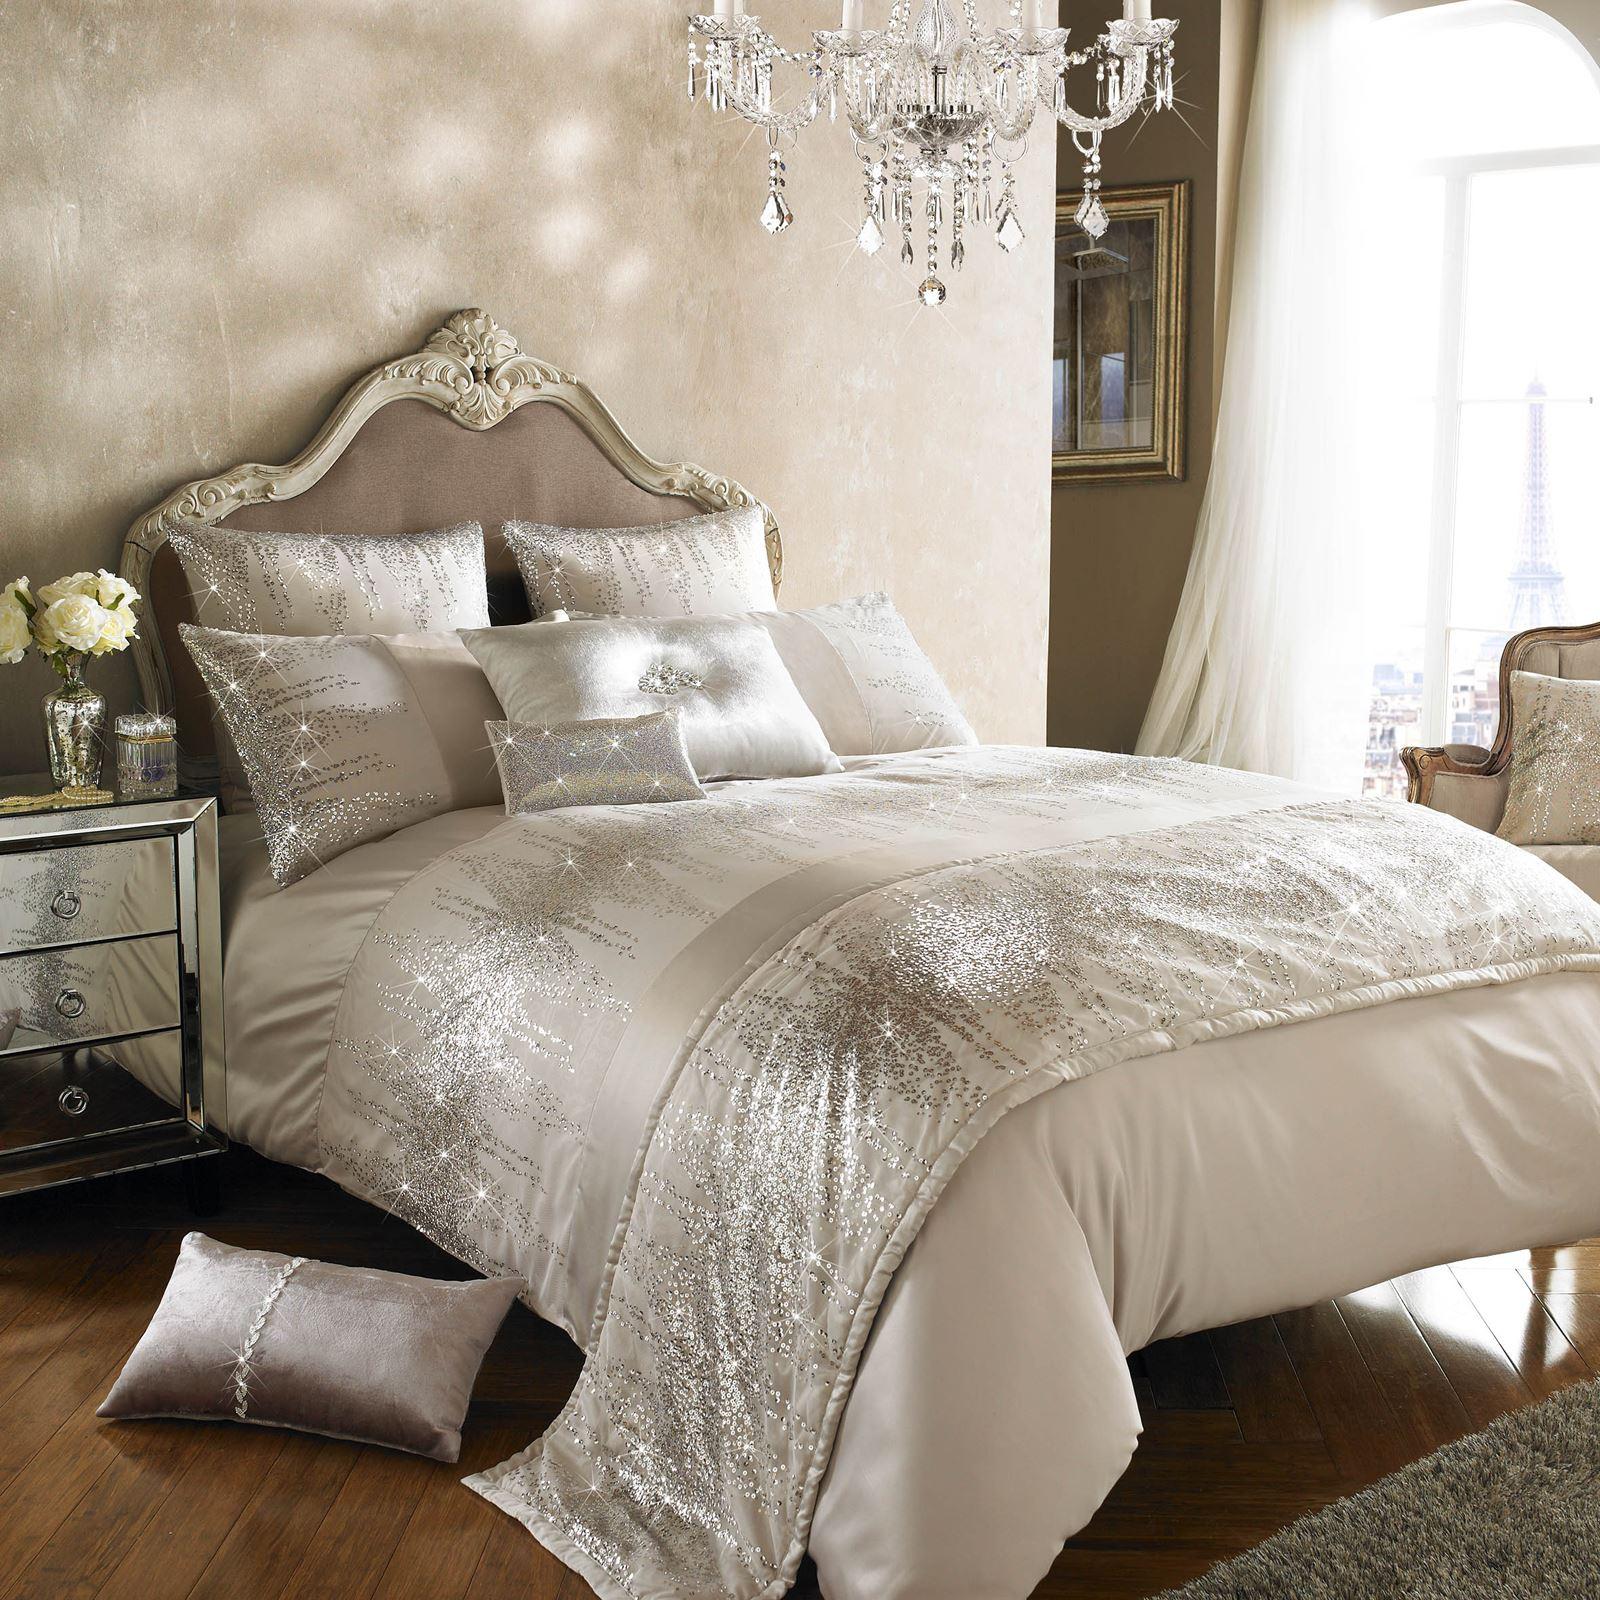 a reviews crush teitelbaum pdx bib harriet set in cover bee blush bed wayfair bath bag duvet